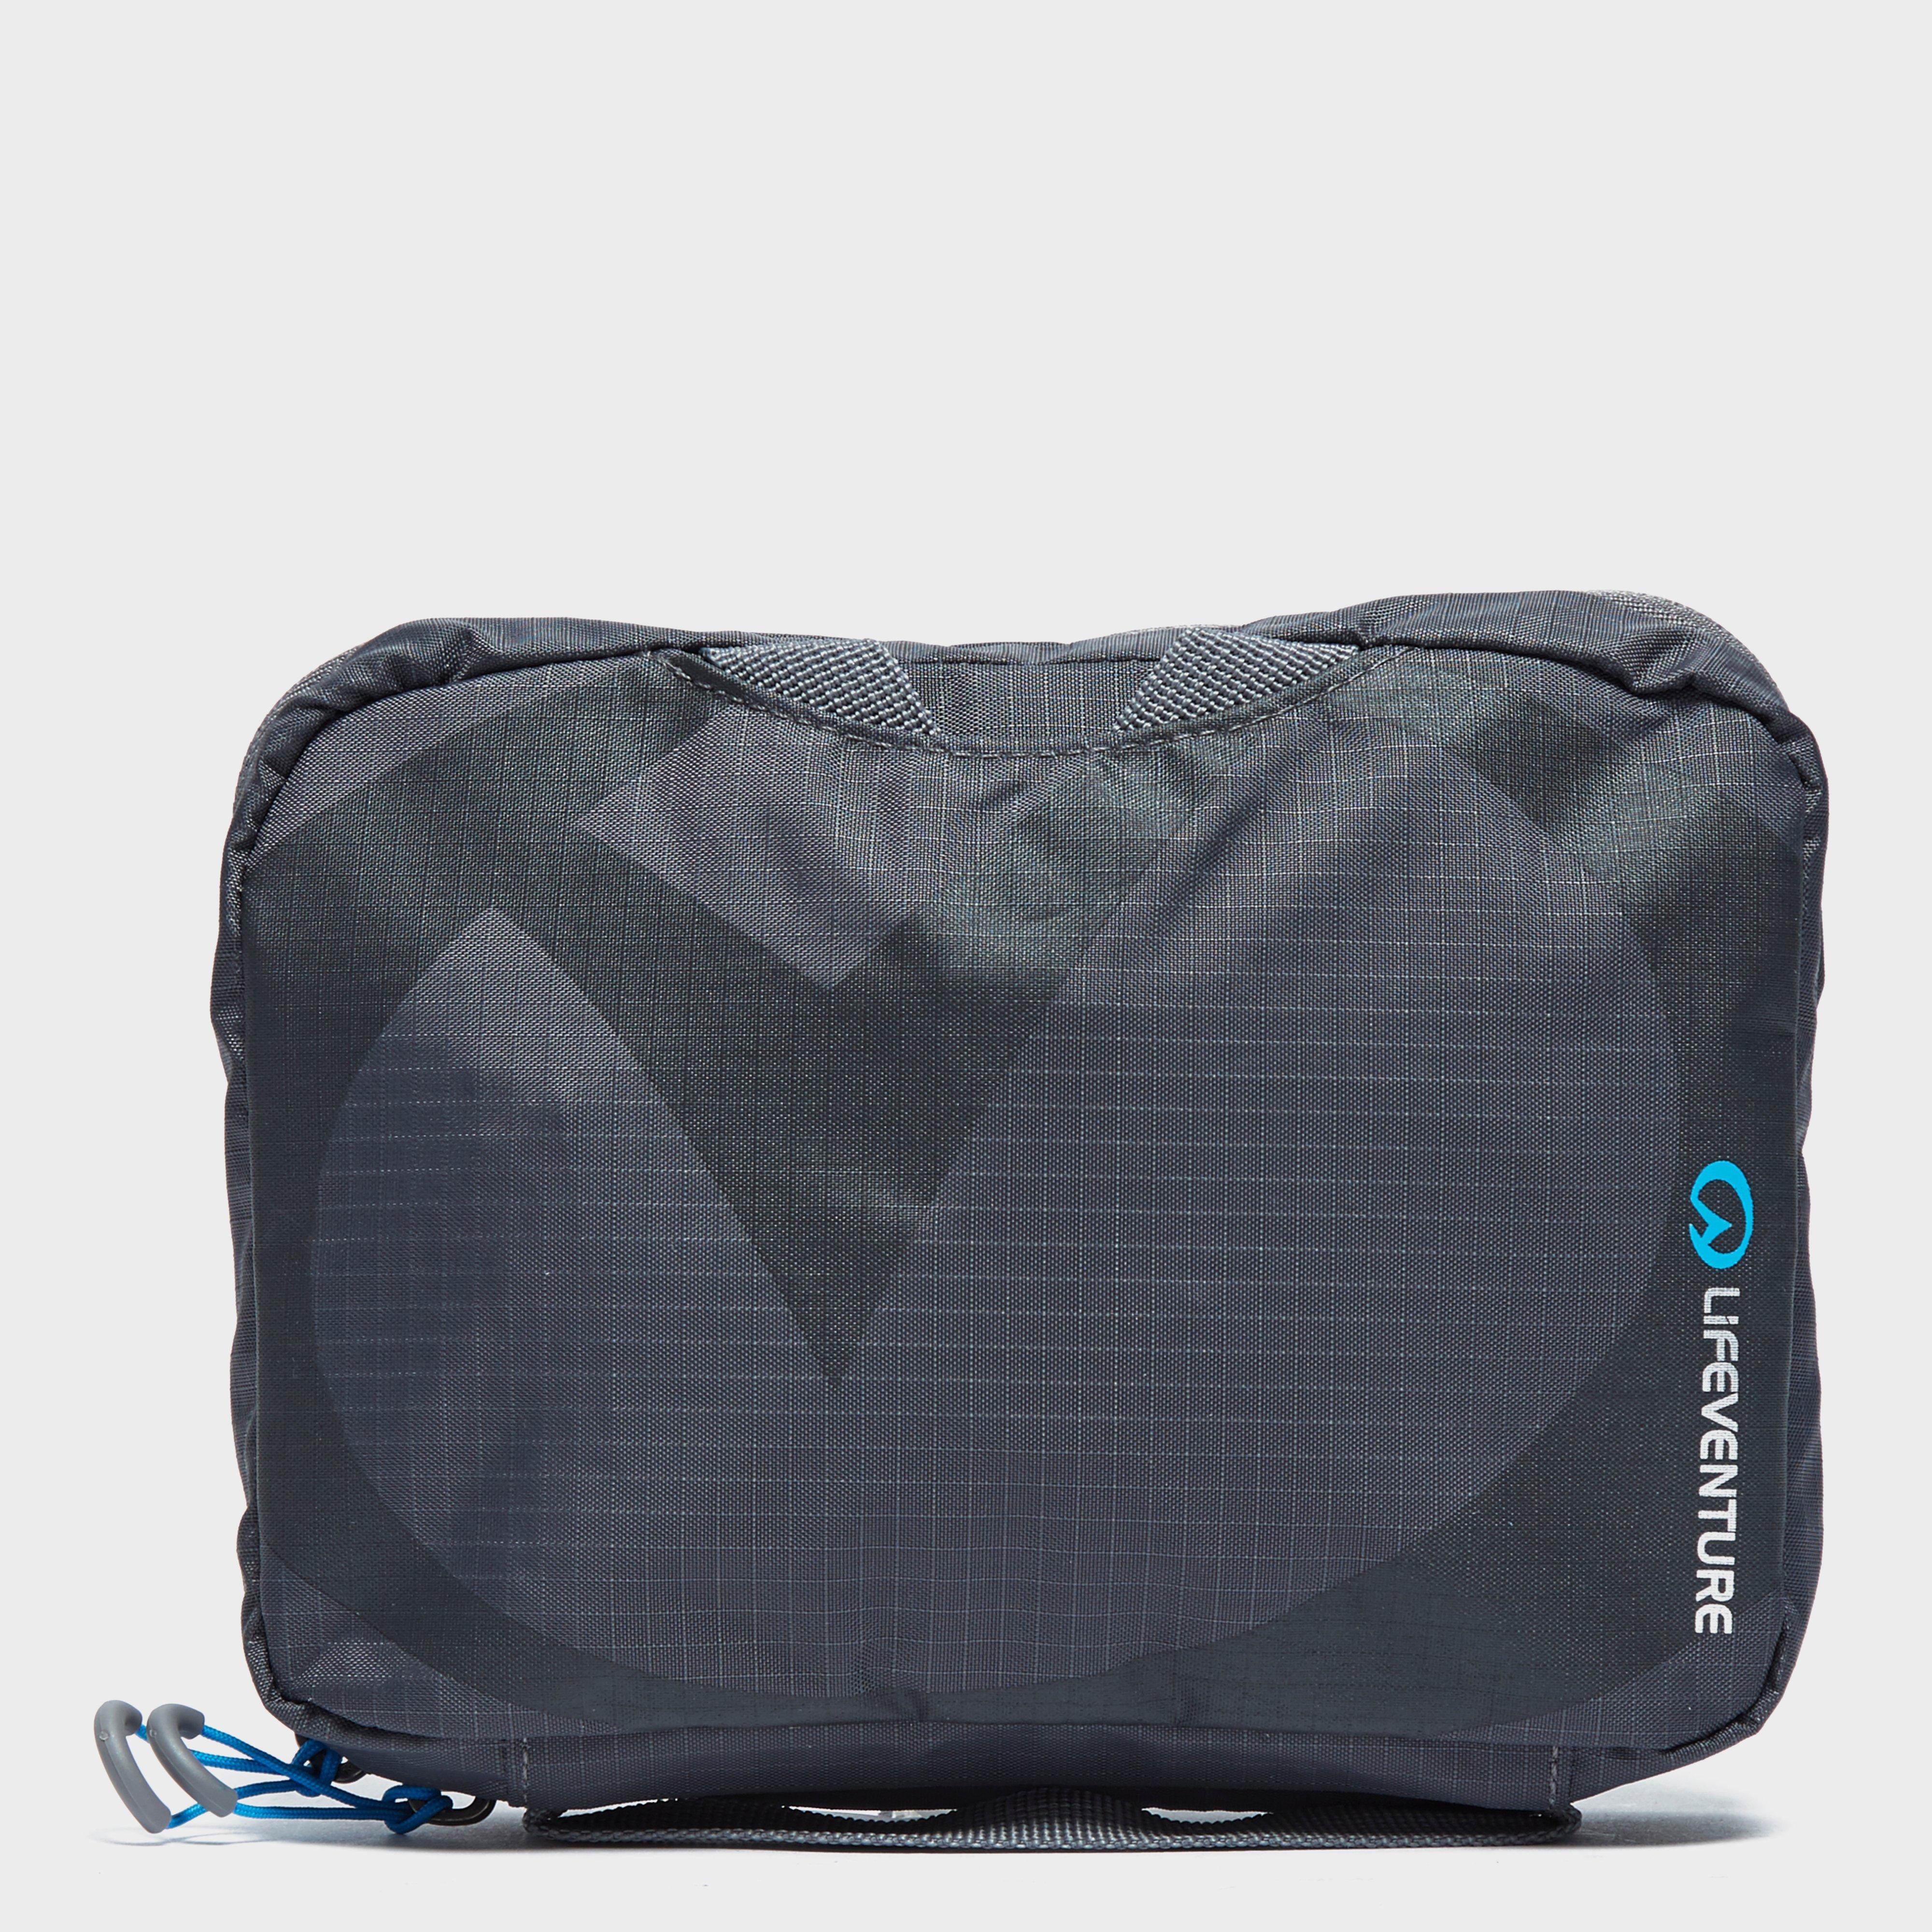 Lifeventure Lifeventure Travel Wash Bag (Small) - Grey, Grey